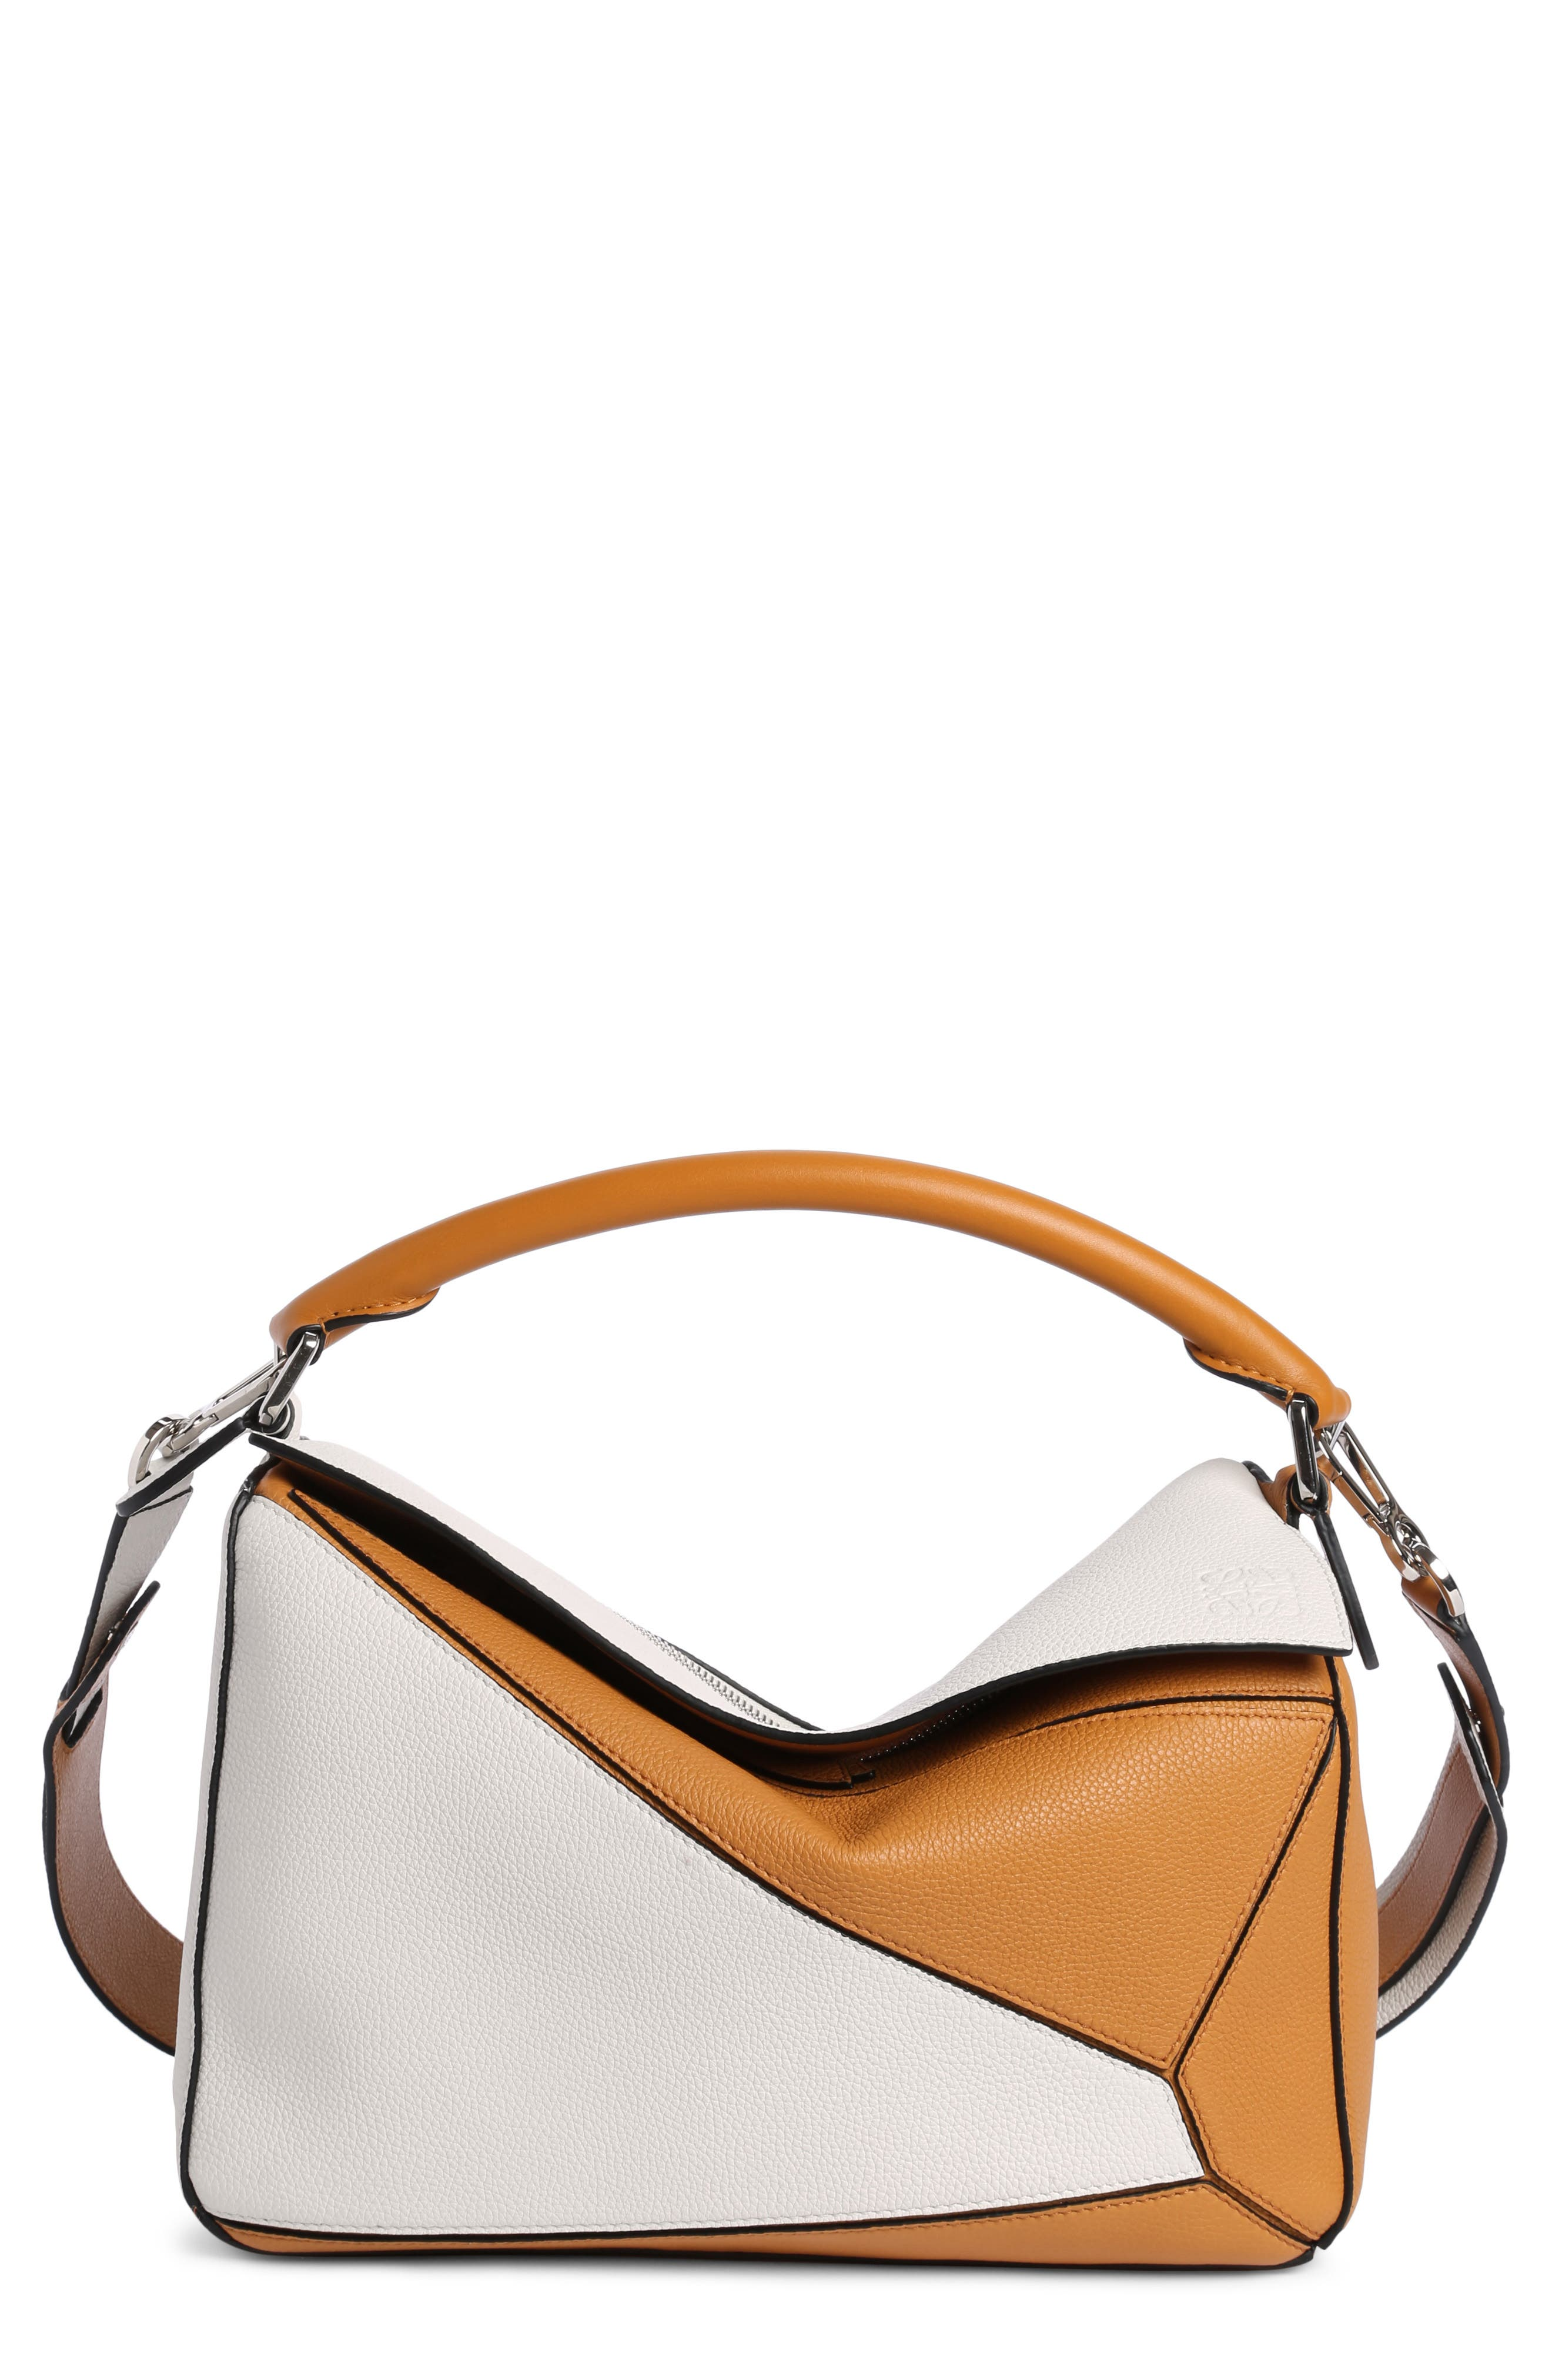 Loewe Puzzle Colorblock Calfskin Leather Bag